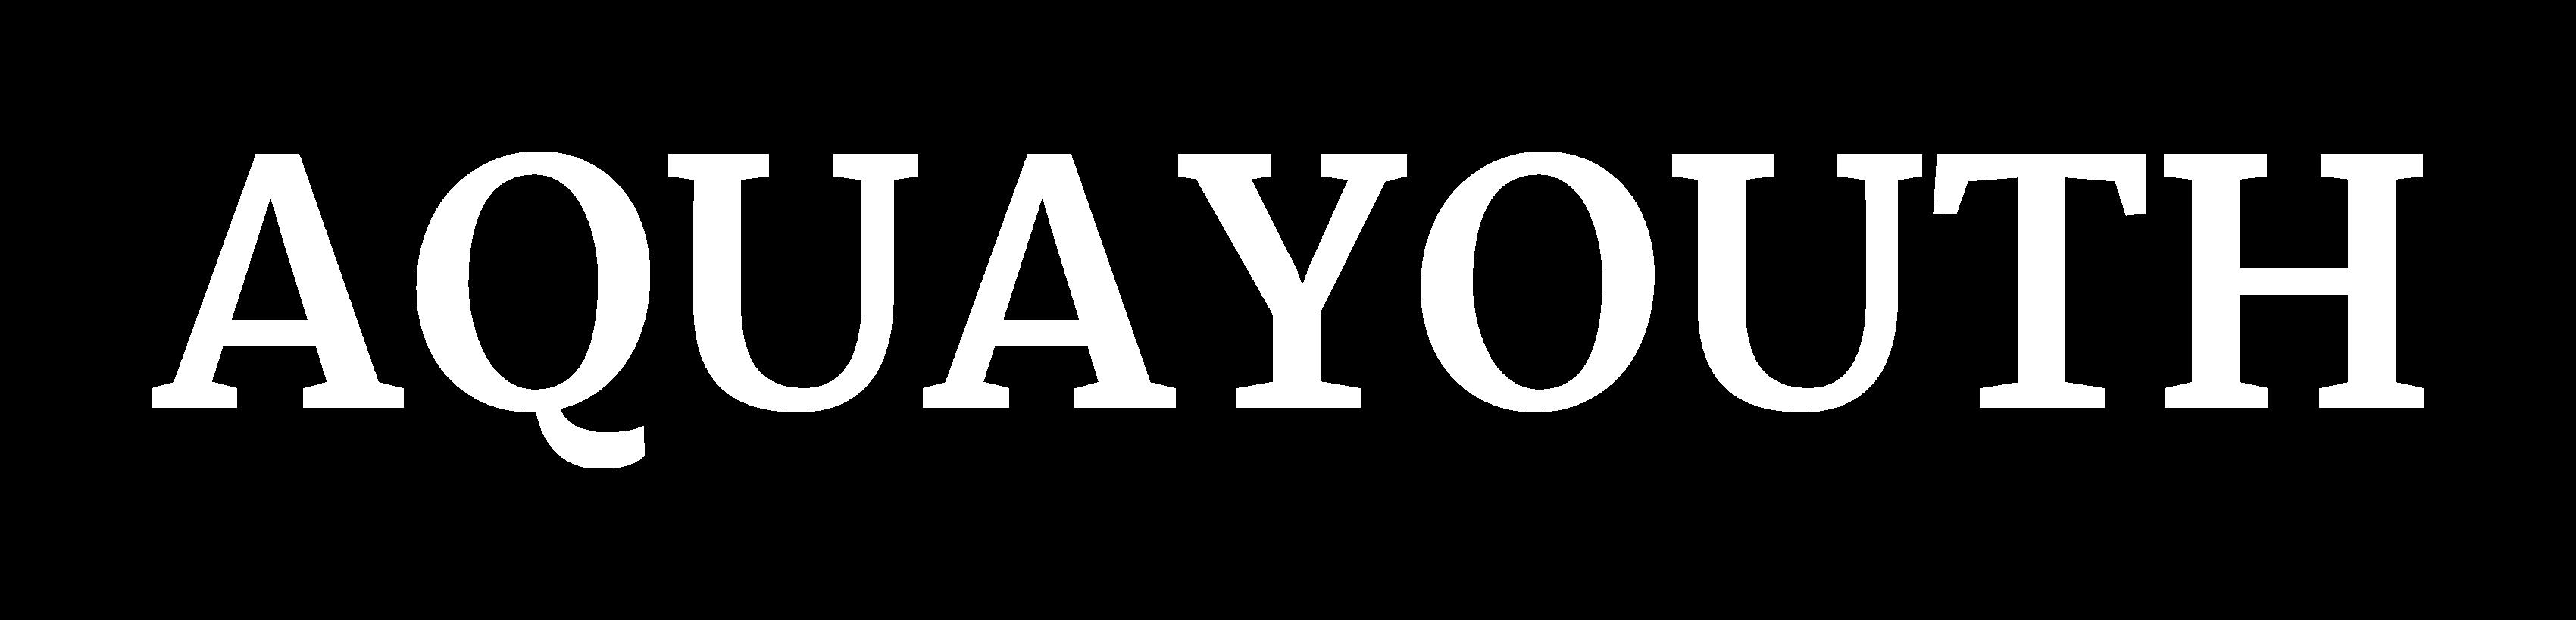 AquaYouth Blog